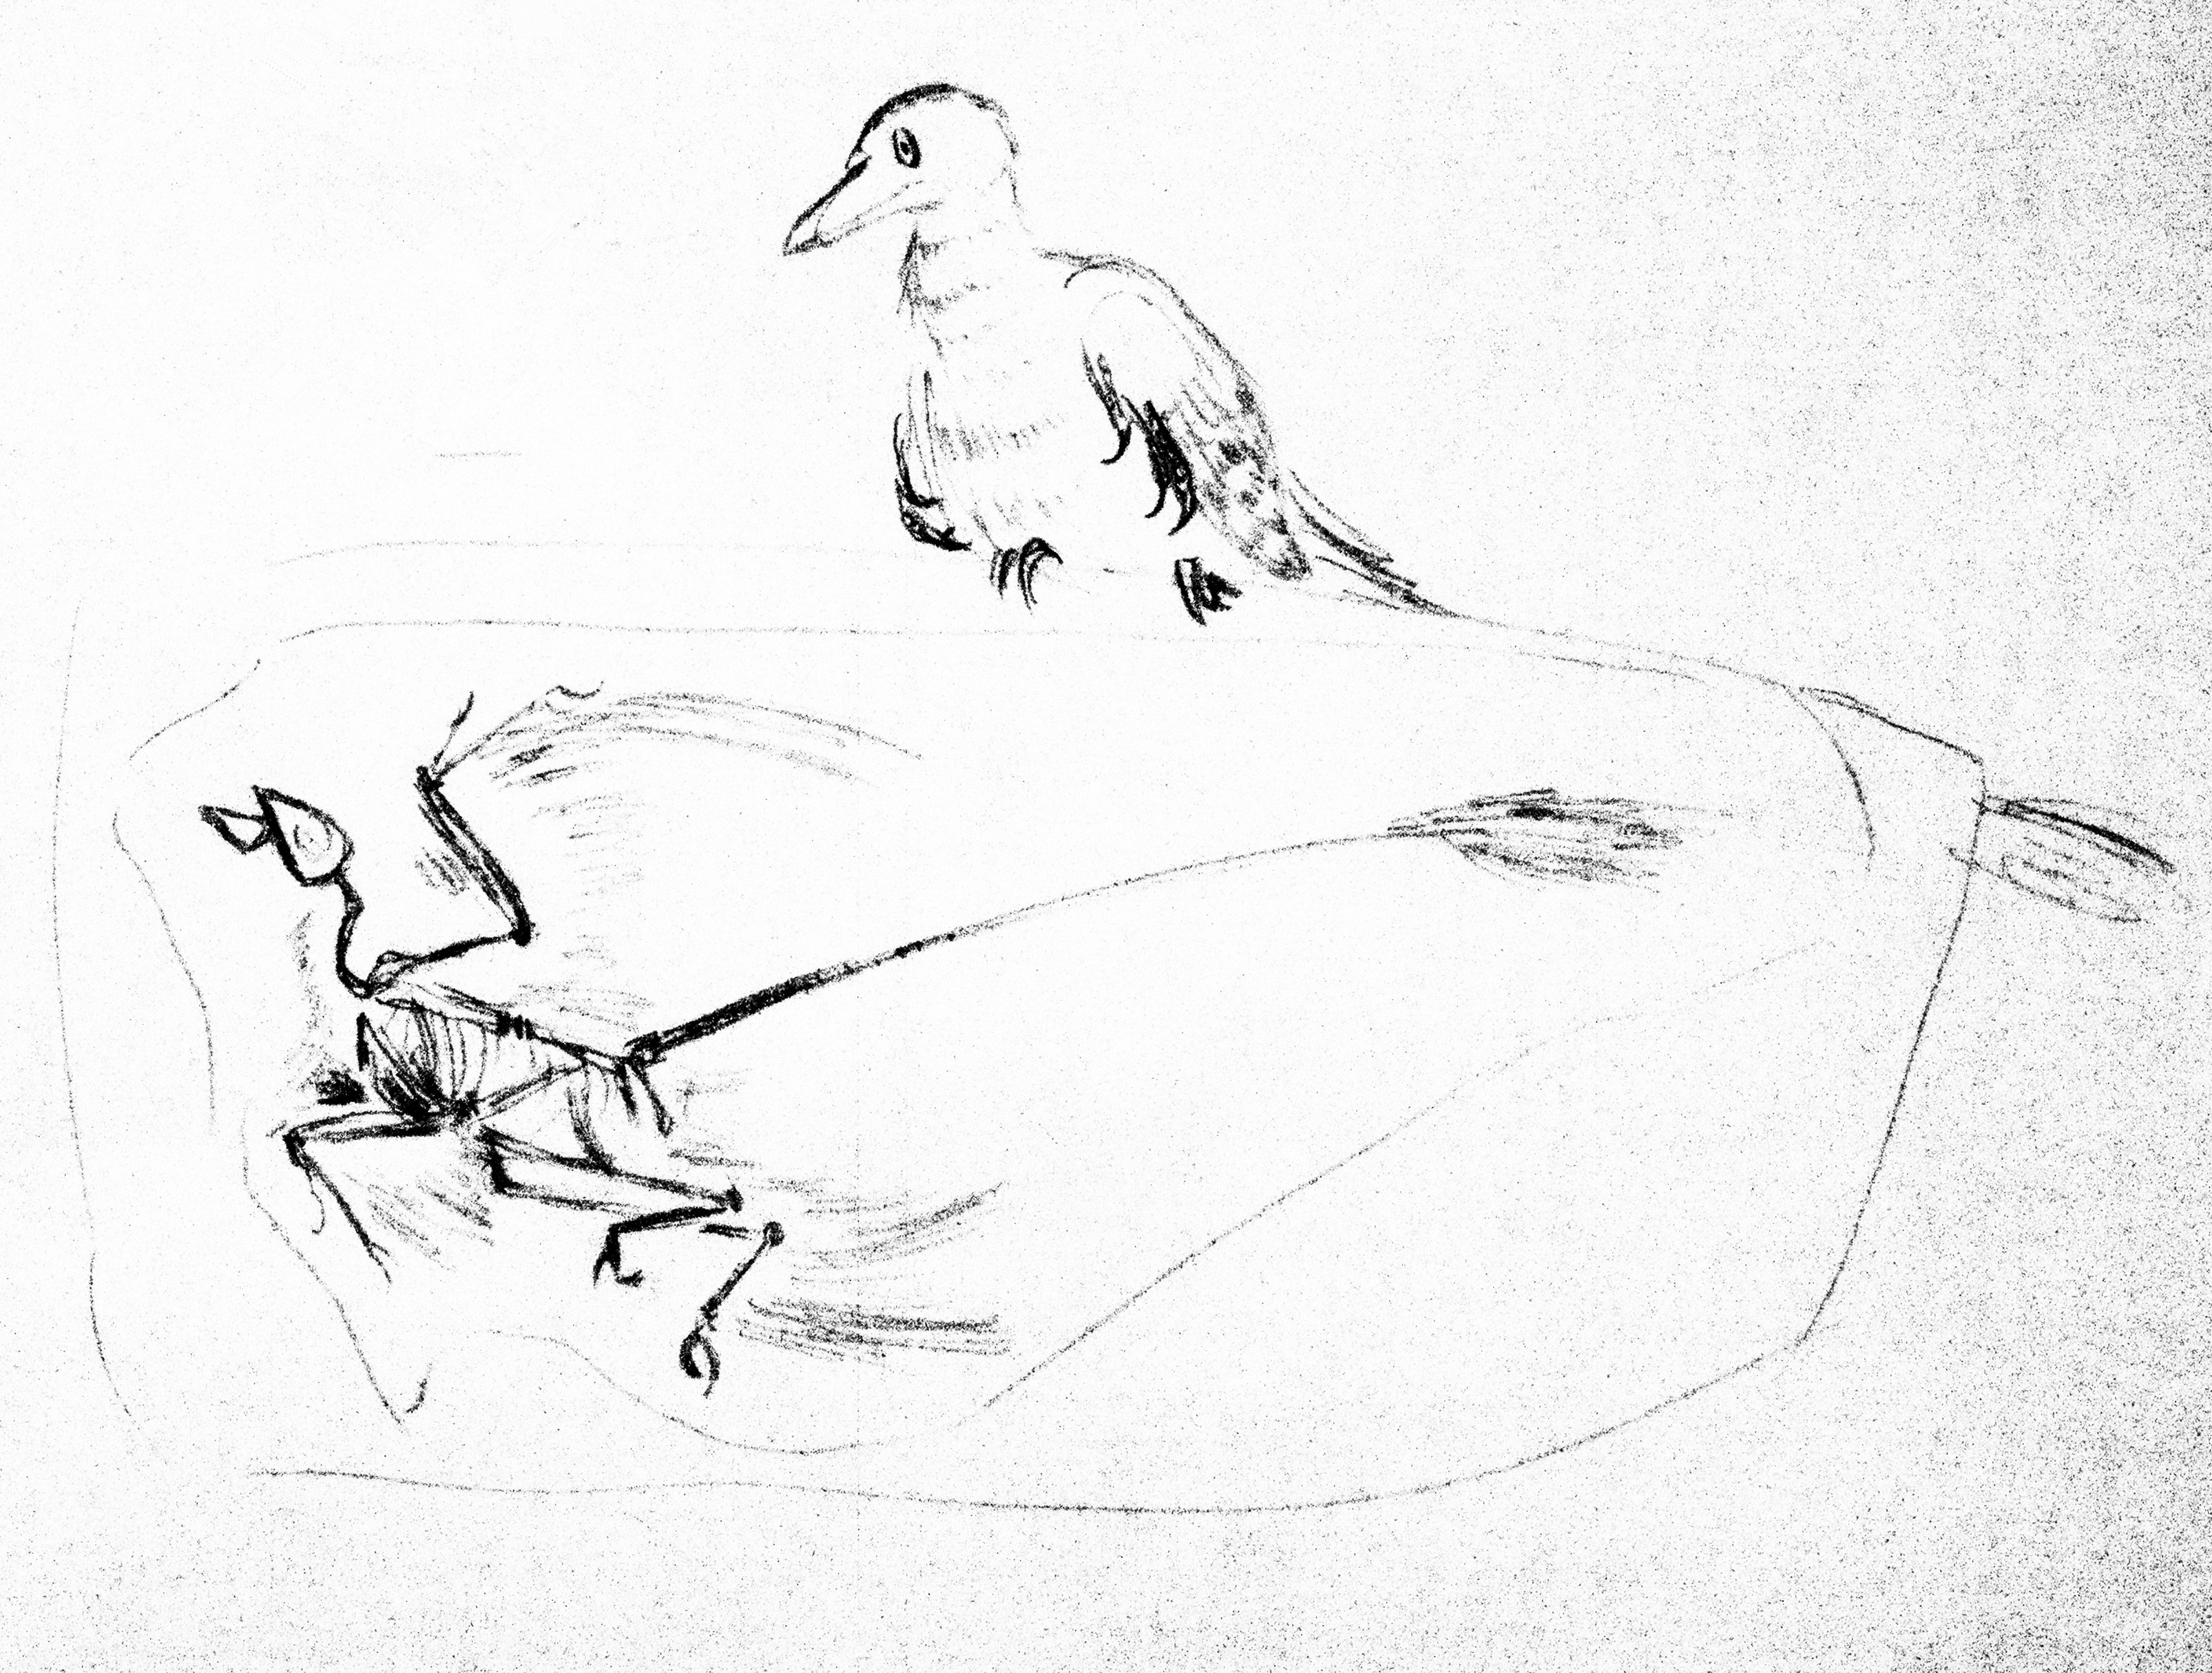 Sinornithosaurus and Microraptor Fossil by Galliraptor on ...